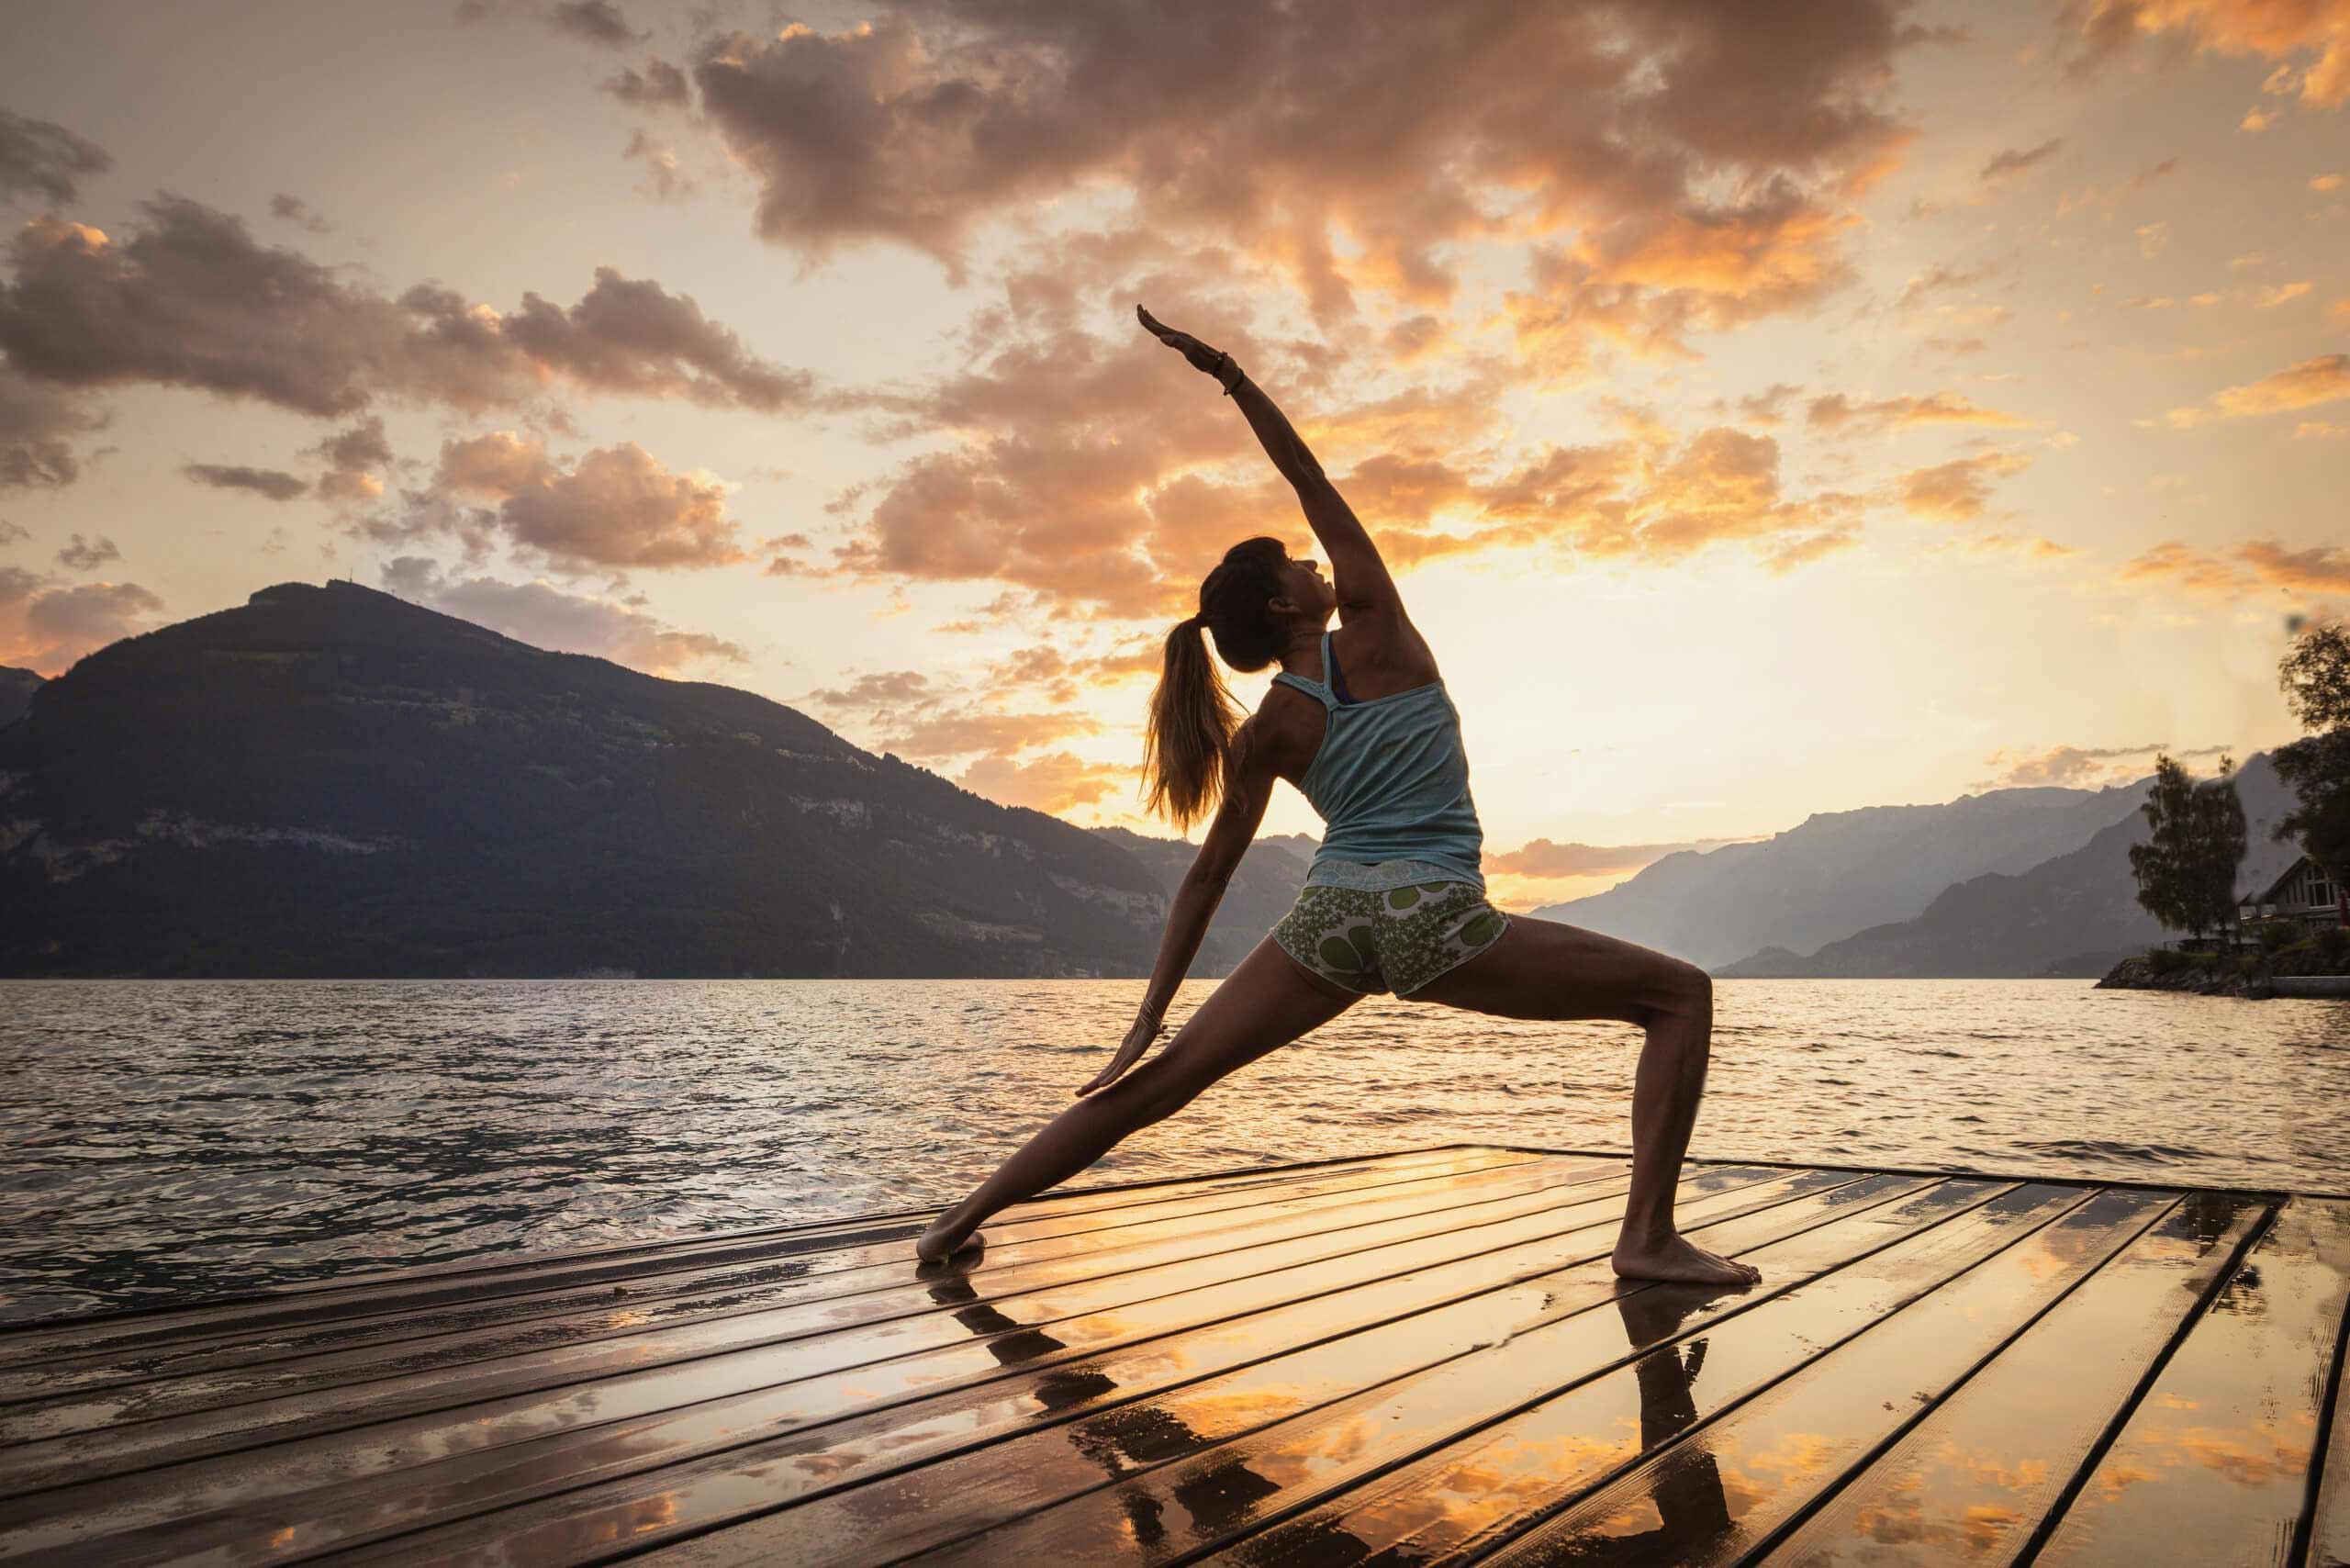 seebad-lido-krattigen-thunersee-sommer-morgenstimmung-yoga.jpg